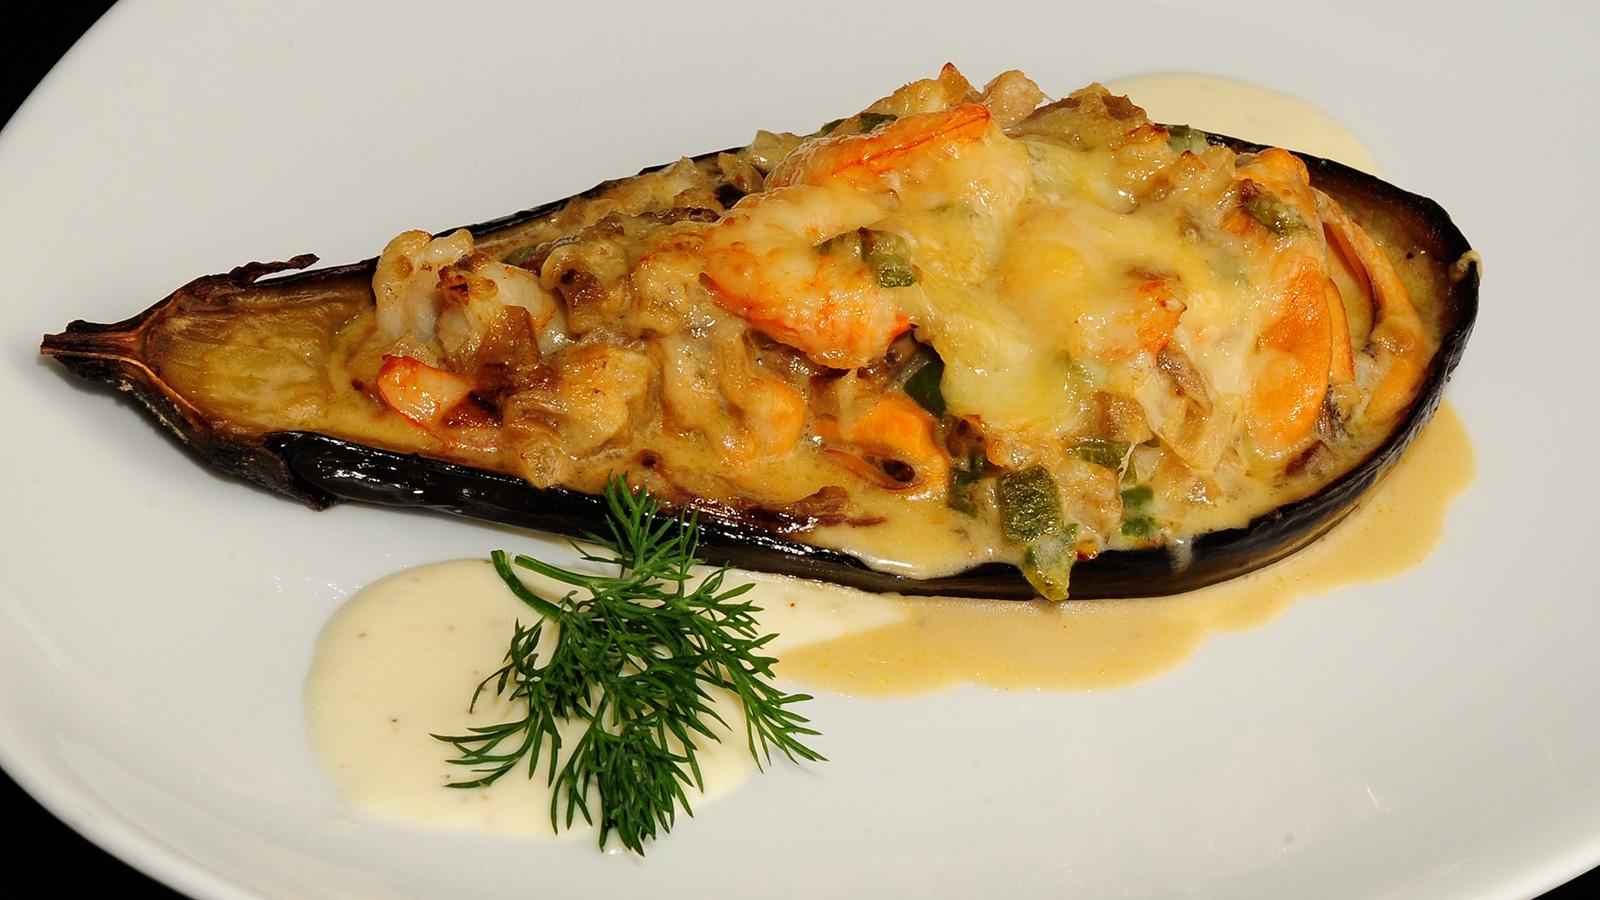 Berenjena rellena de marisco sergio fern ndez receta for Cocina berenjenas rellenas